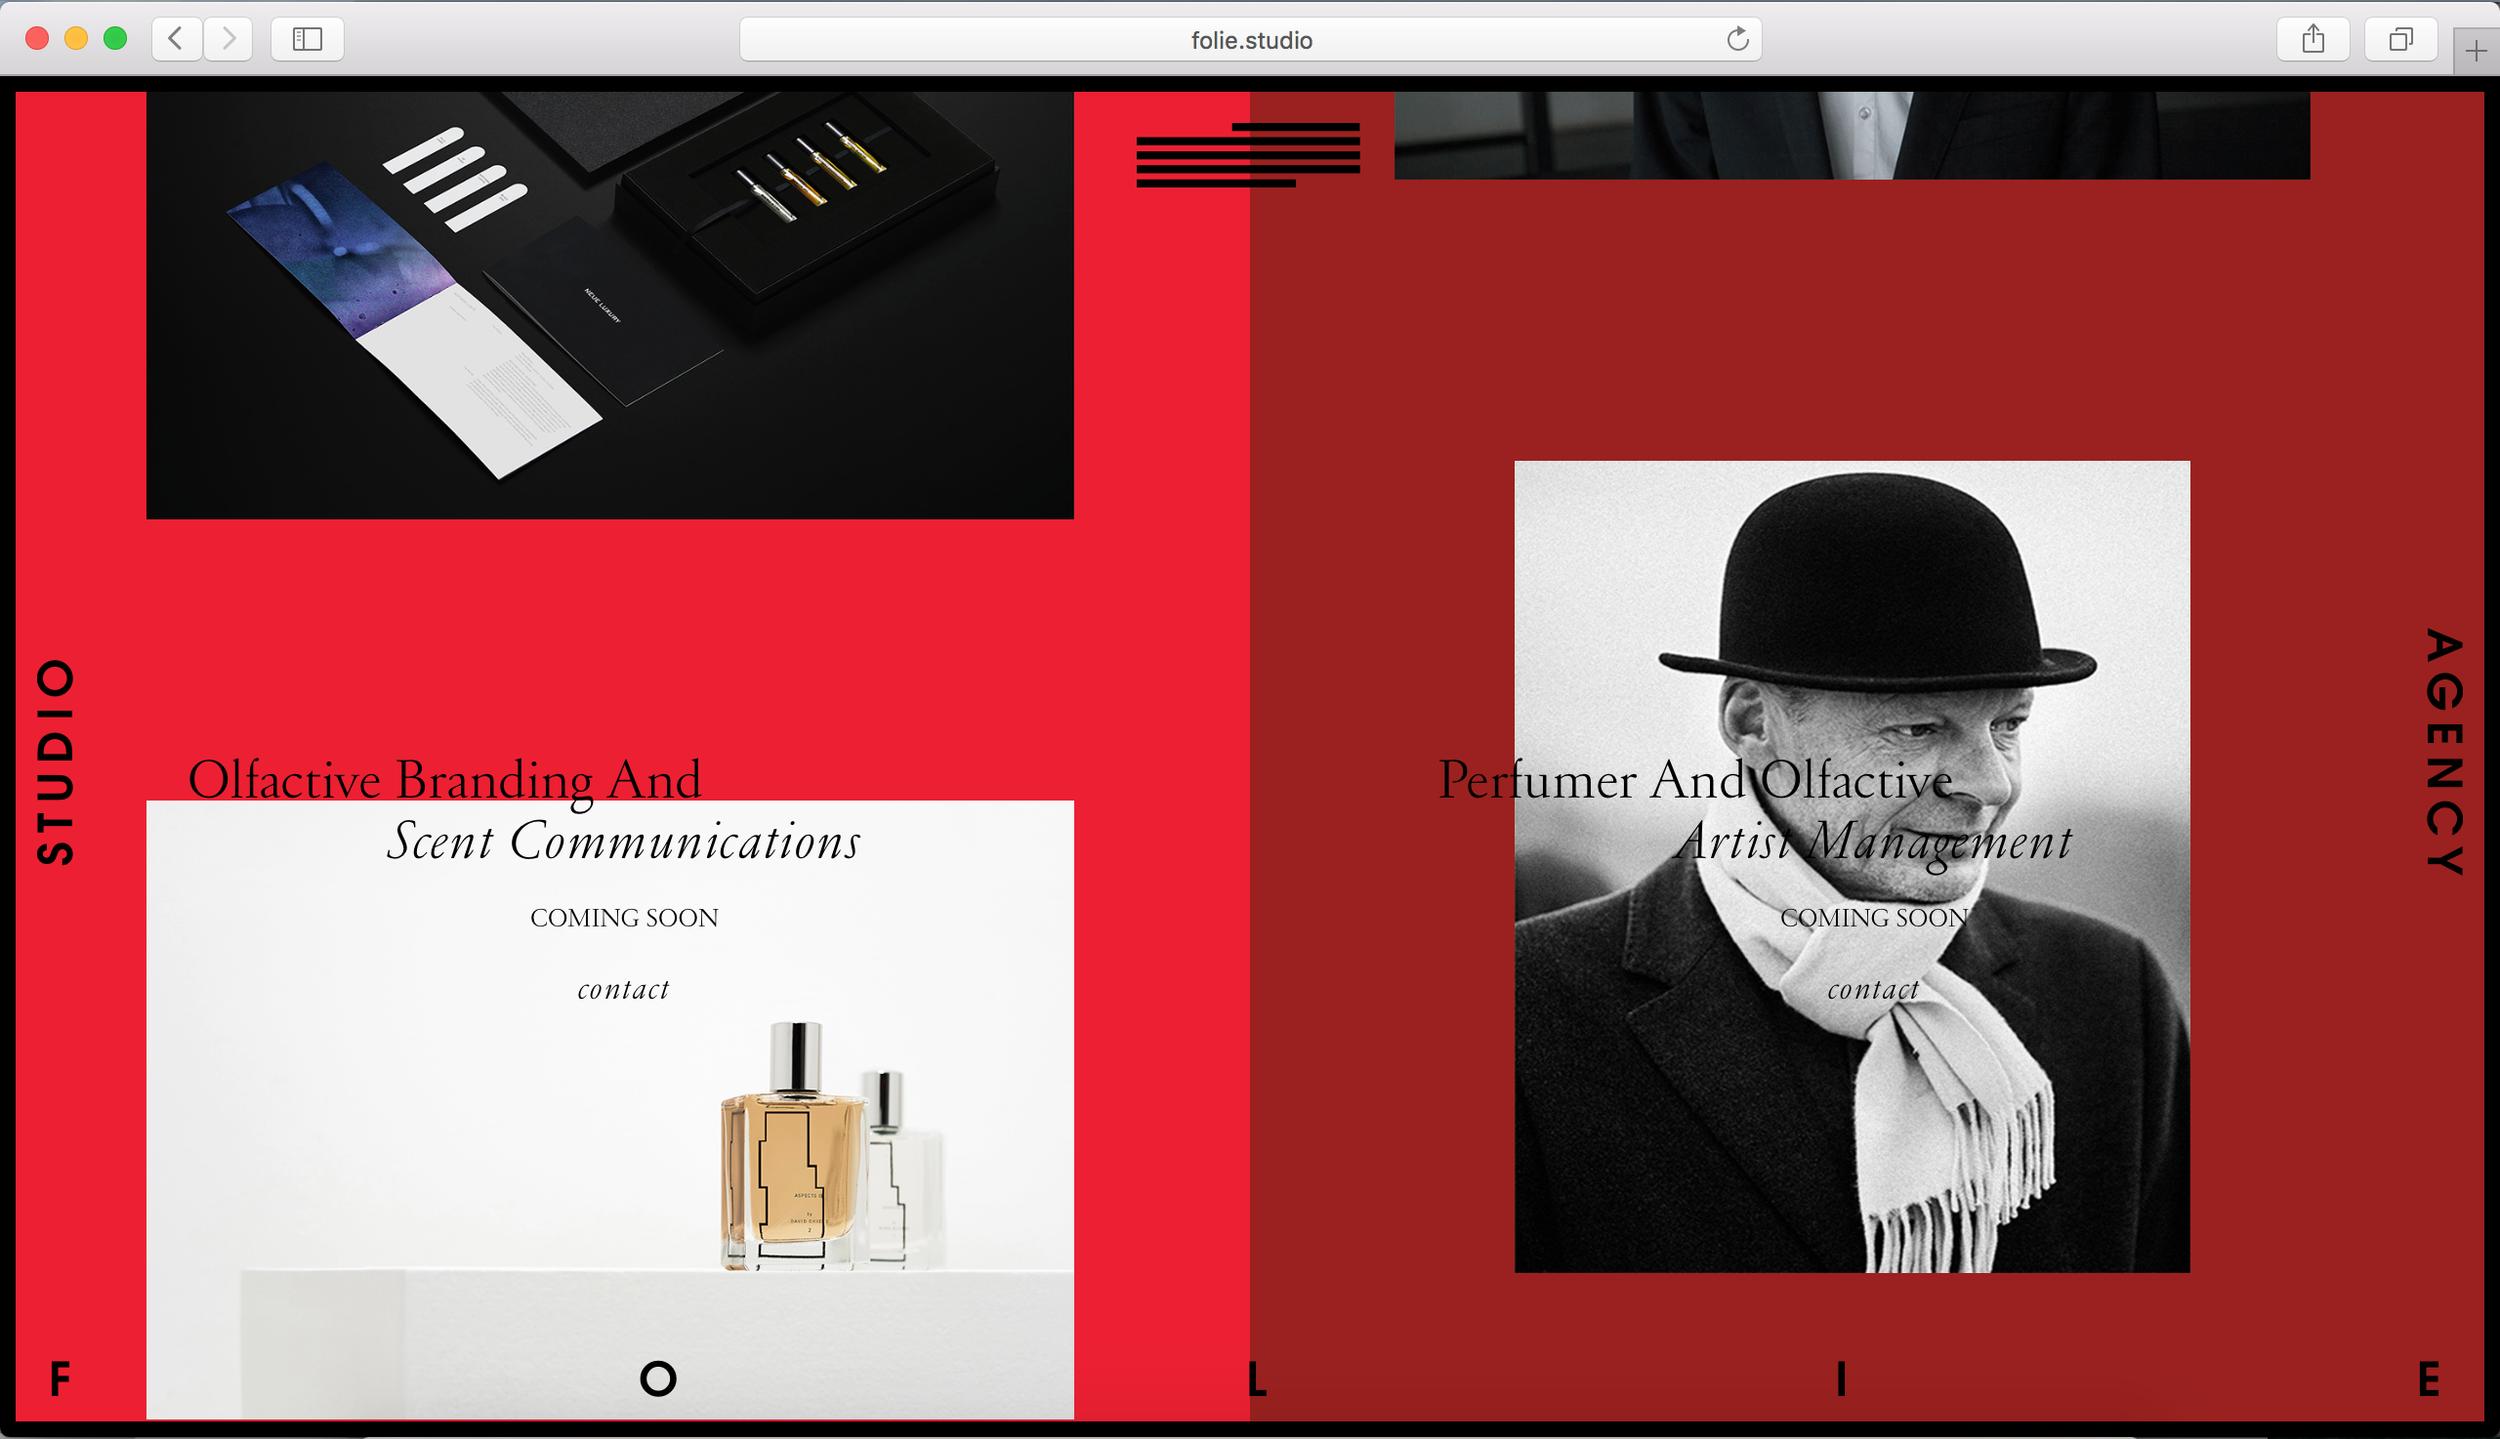 Studio-Folie-Olfactive-Agency-Fragrance